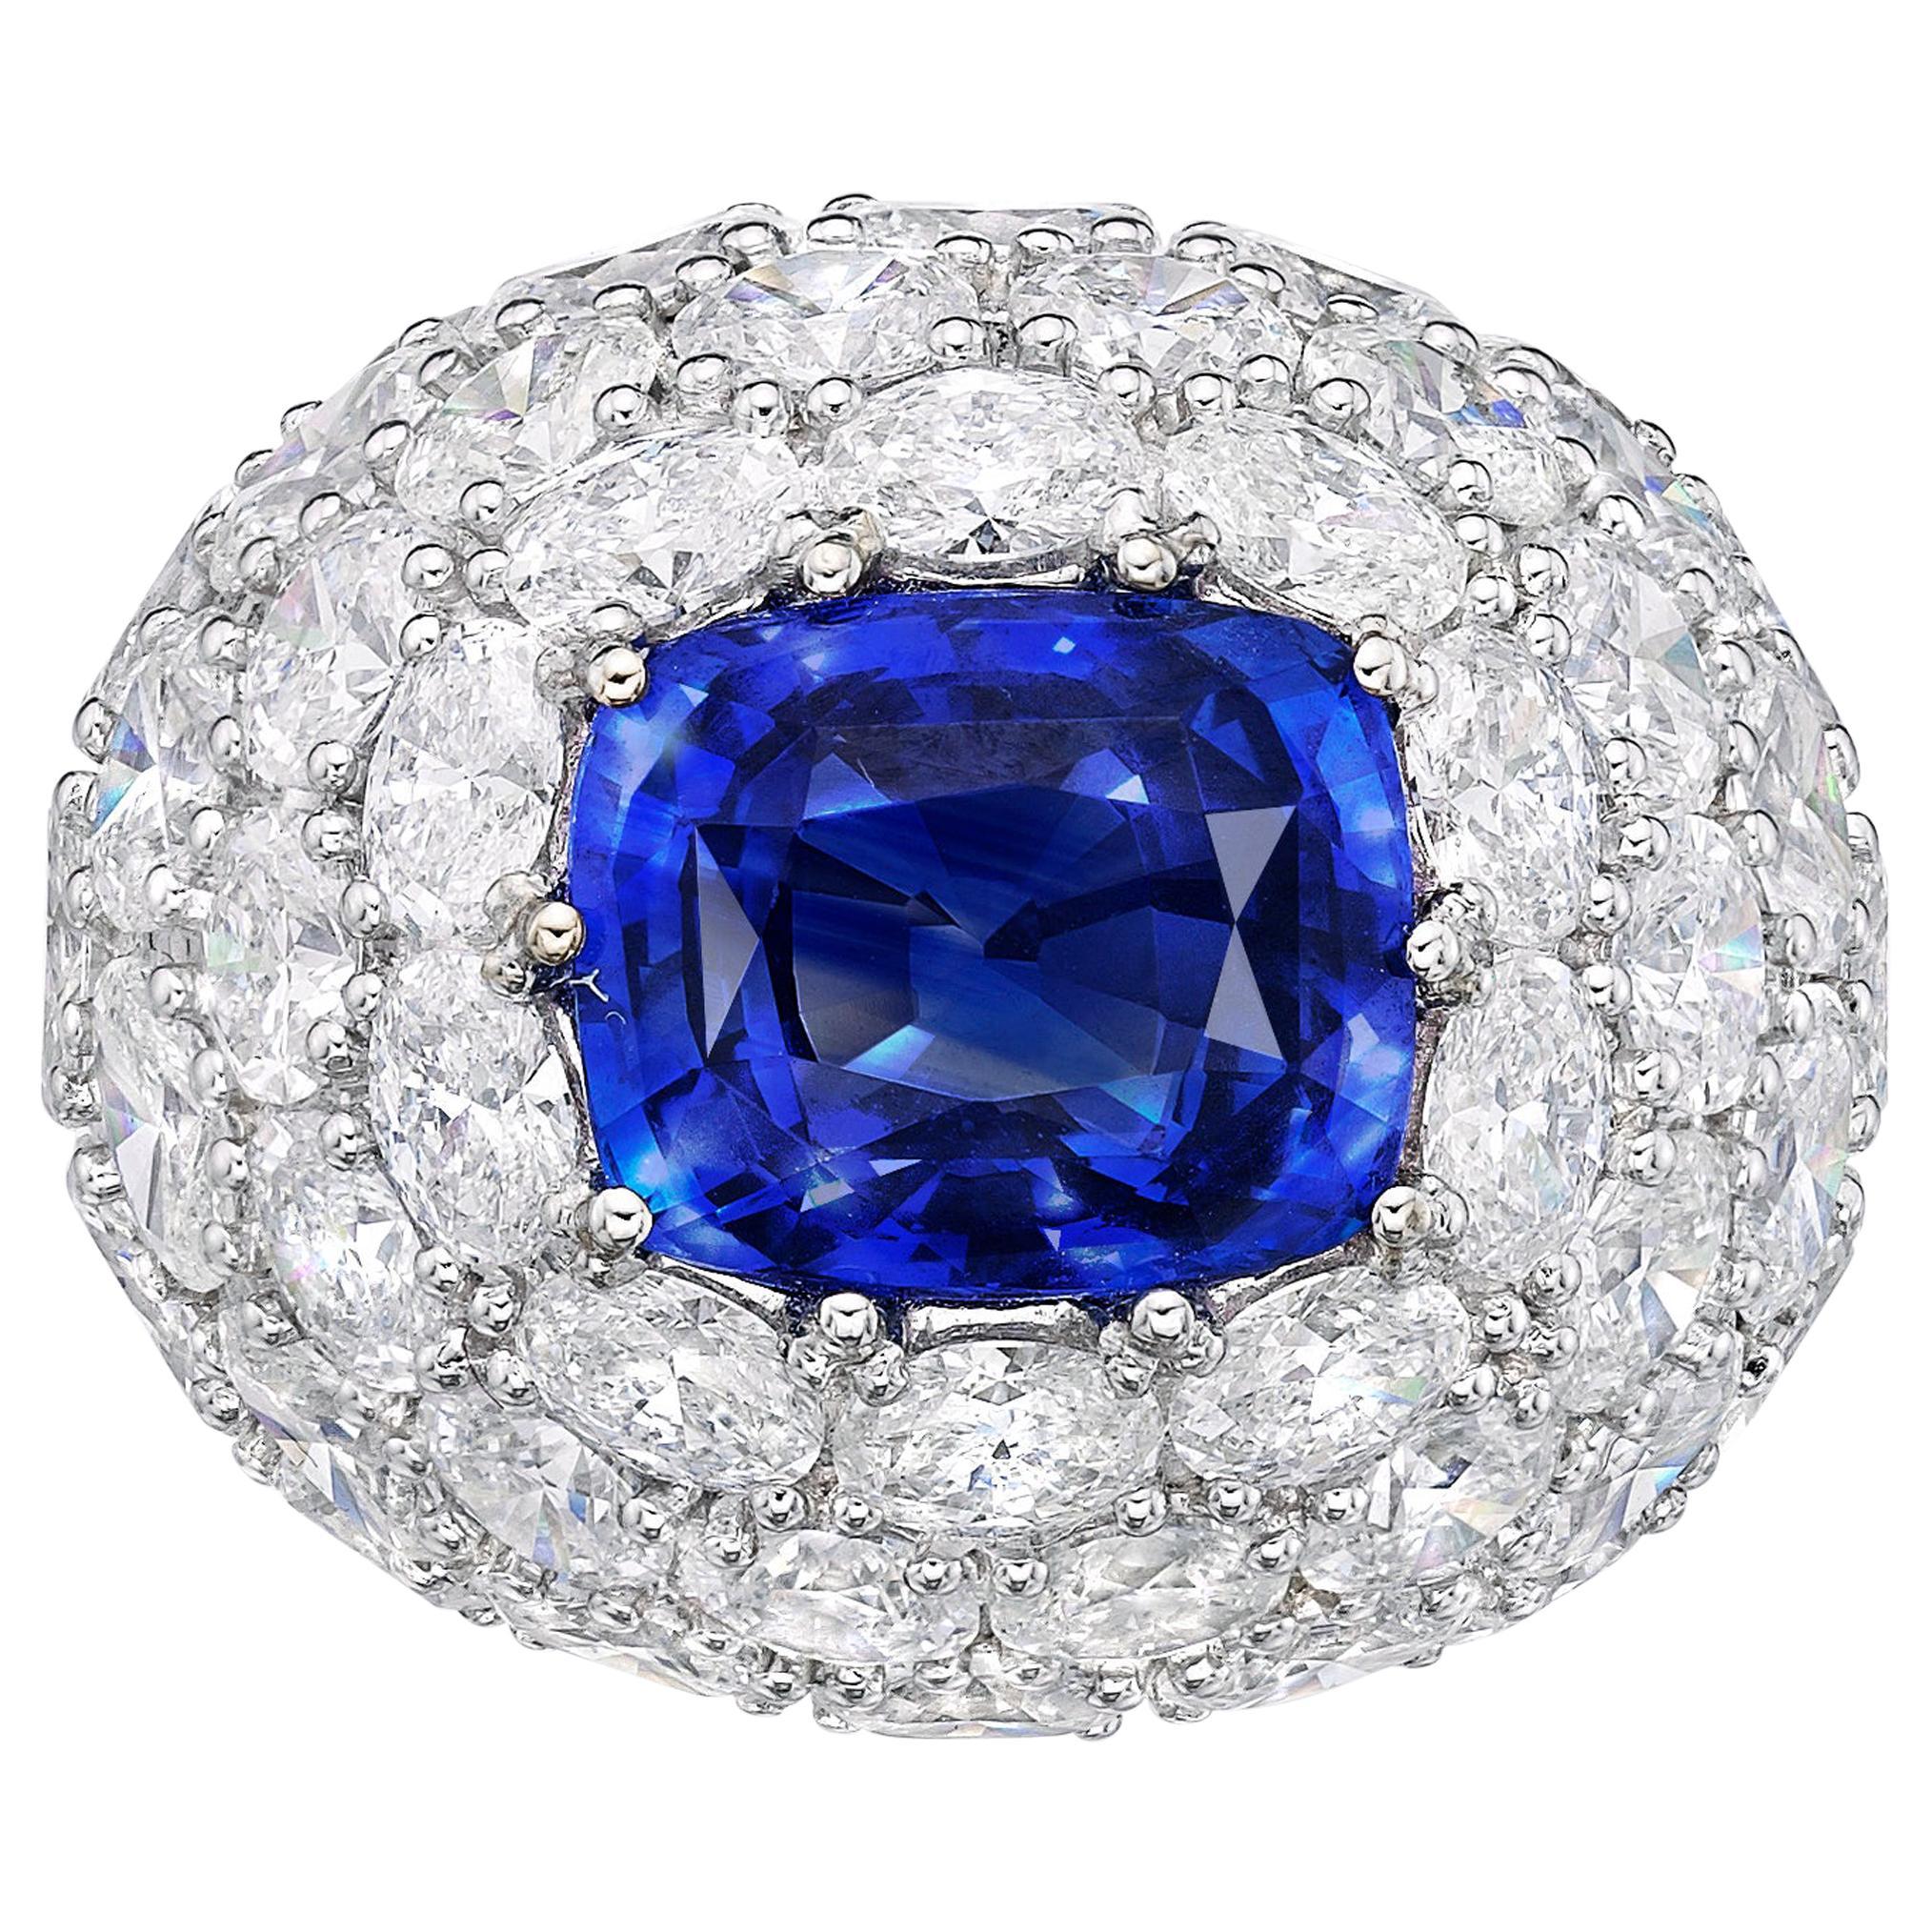 7.96 Carat Royal Blue Sapphire GRS Certified Unheated Diamond Ceylon Ring Oval